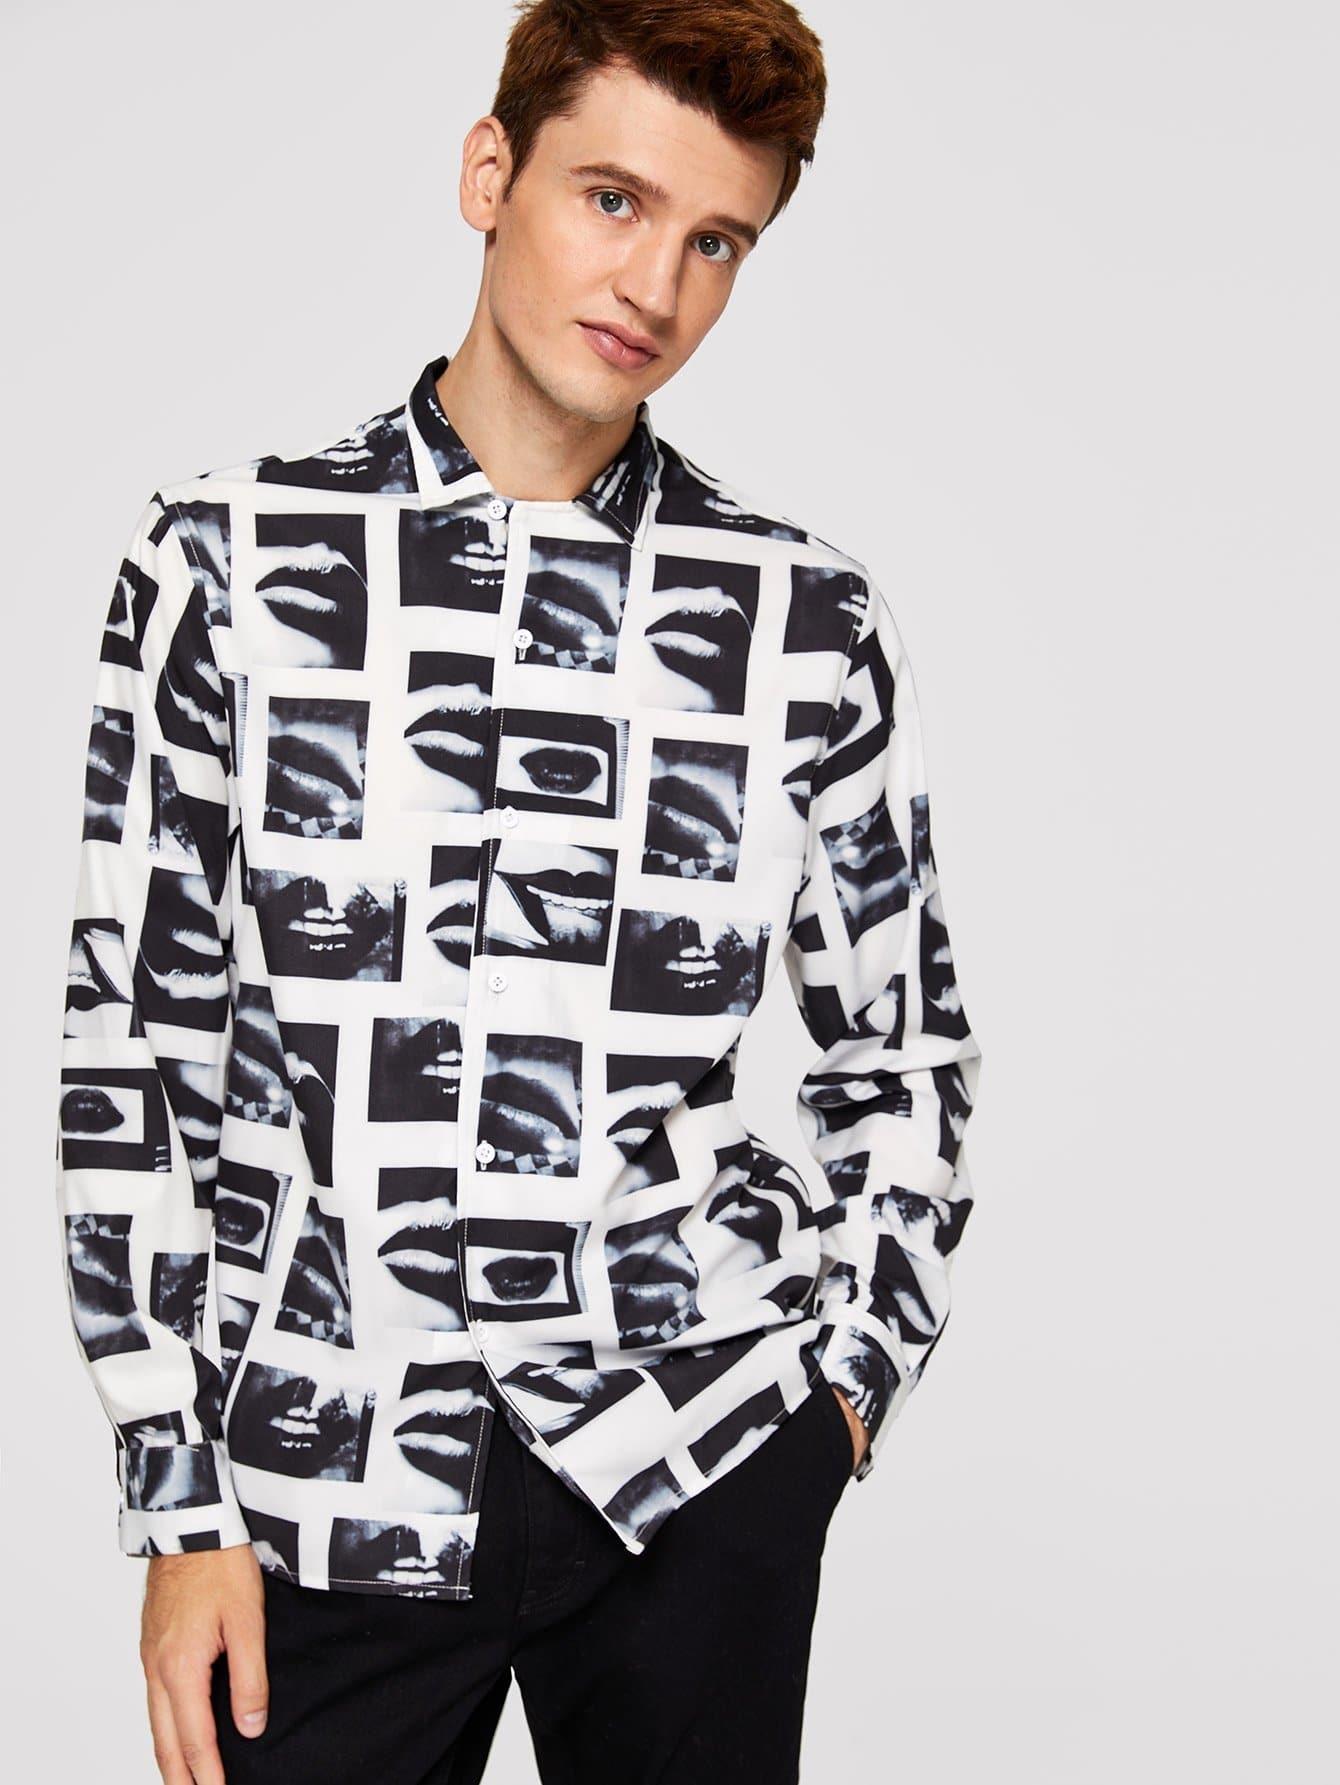 Men Graphic Print Shirt Men Graphic Print Shirt